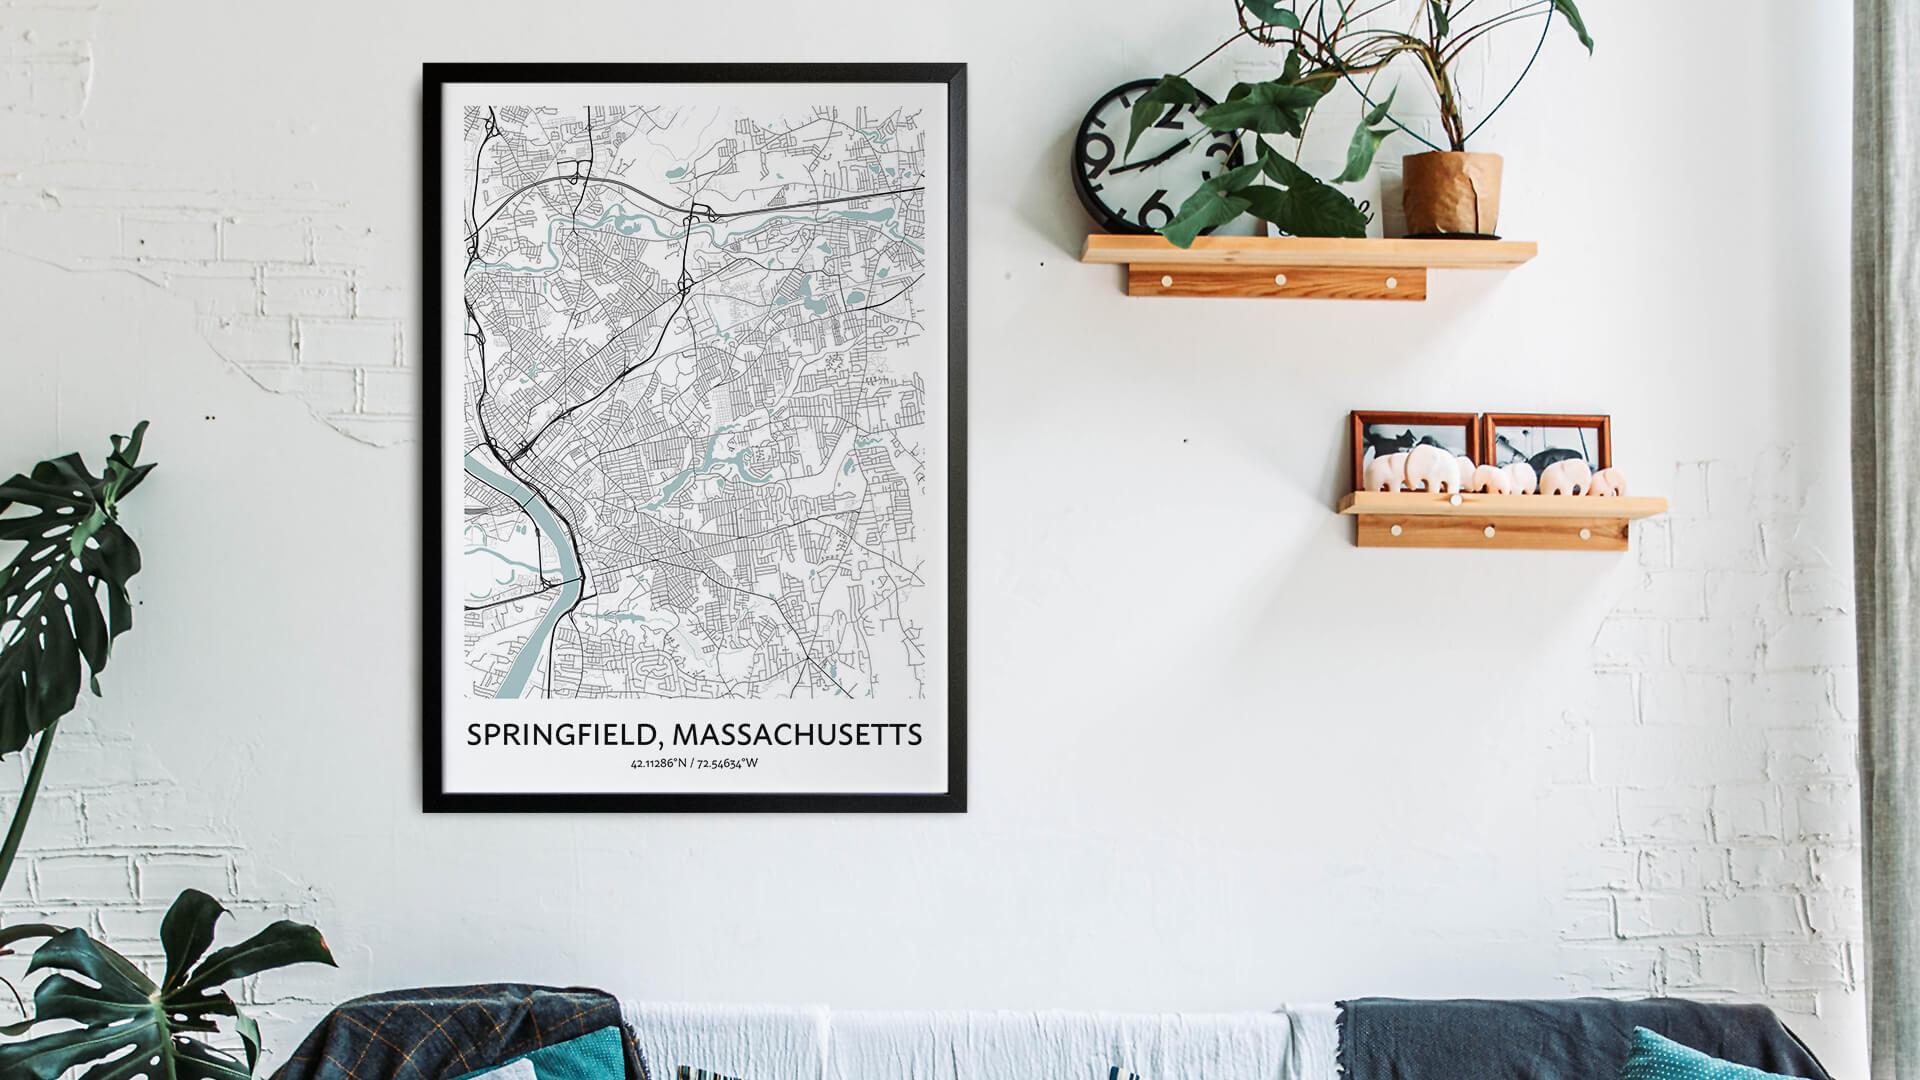 Springfield Massachusetts map art